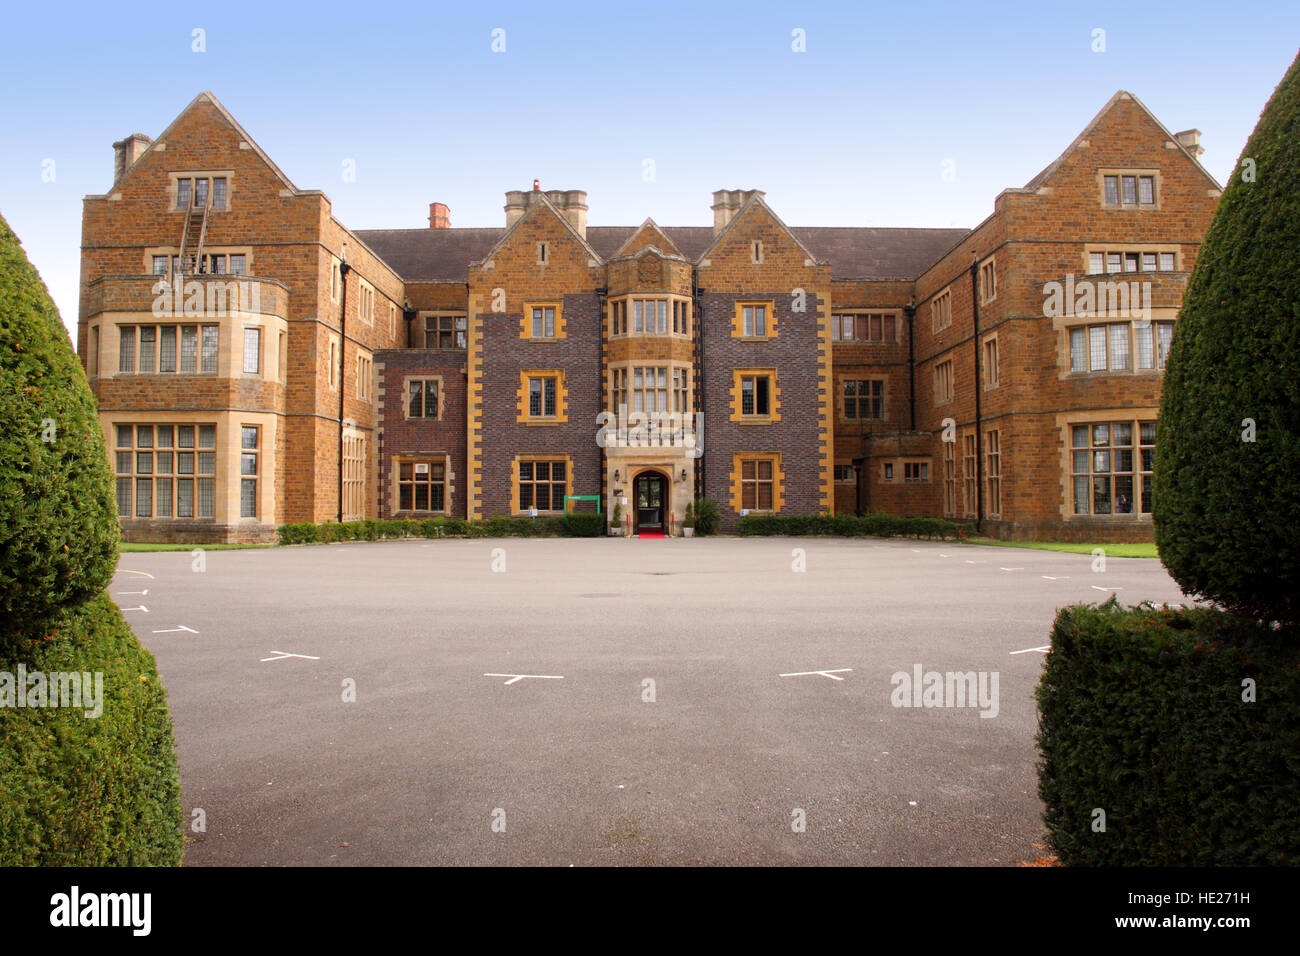 Ashorne Hill Conference Centre And Wedding Venue Near Leamington Spa Warwickshire